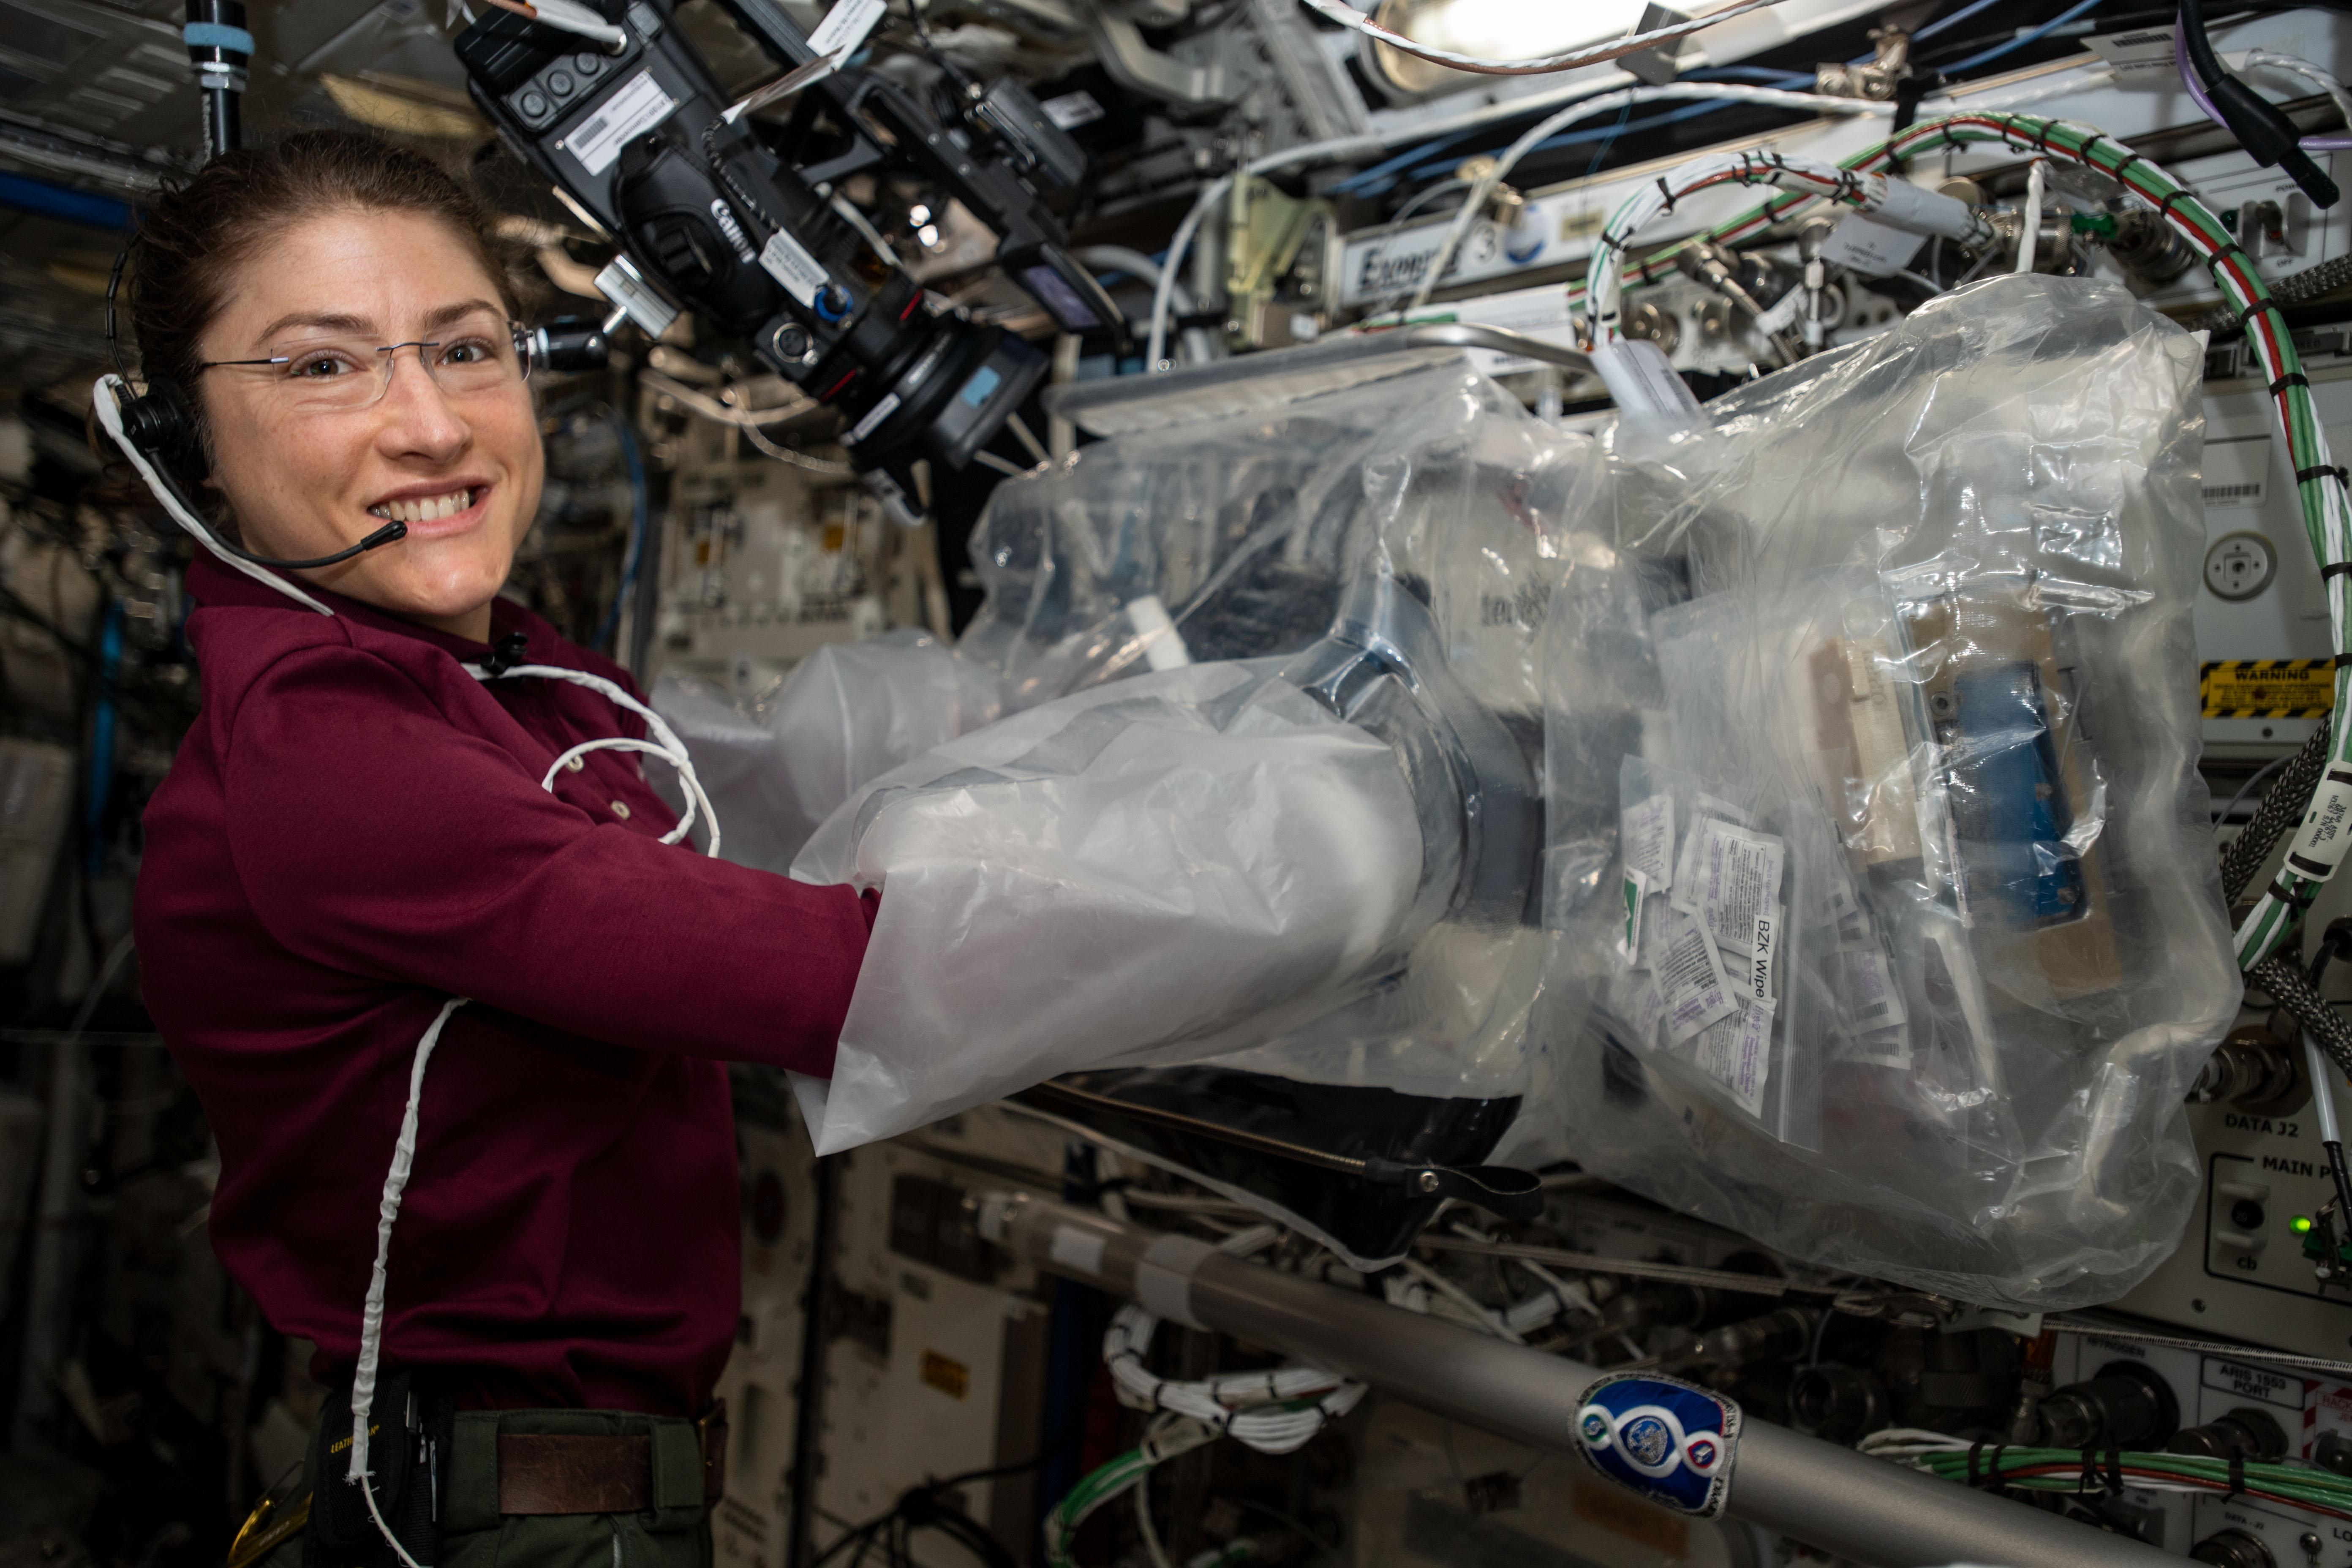 Astronaut Christina Koch operating the 3D BFF, a 3D printer on board the ISS. Photo via NASA.